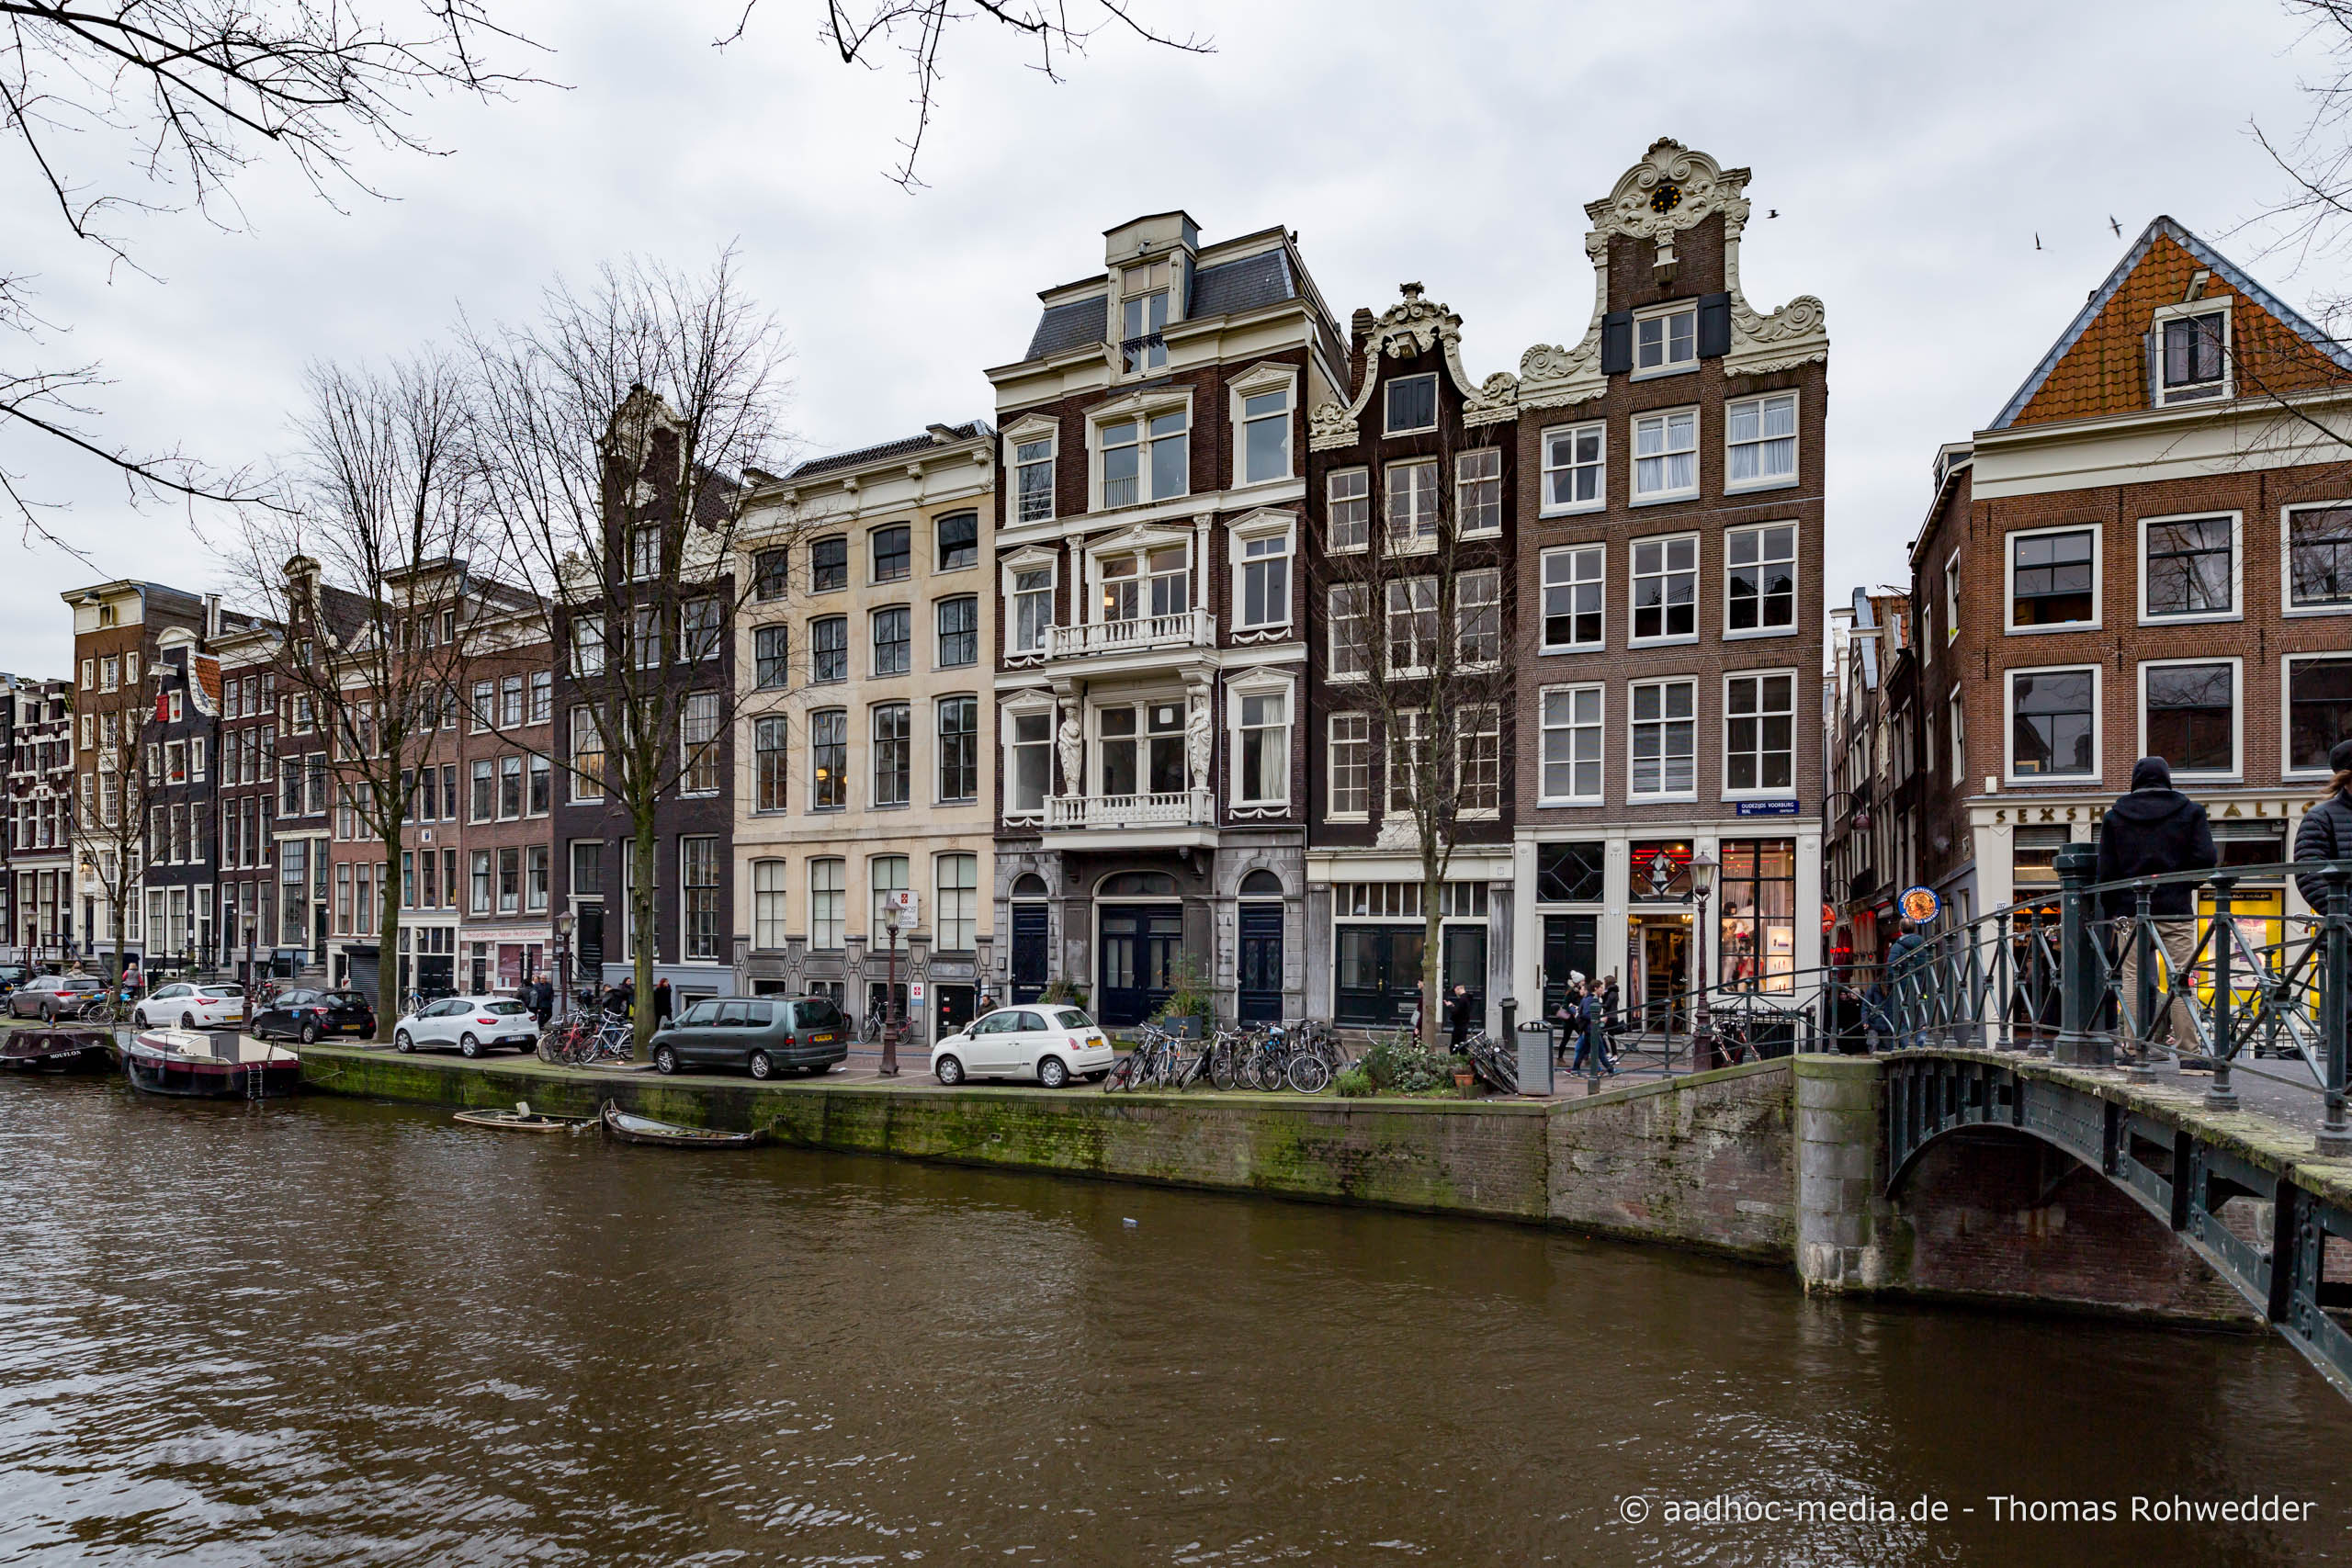 Der Hochzeistfotograf Kiel in Amsterdam 2016 - Momentalist - Foto: aadhoc-media.de